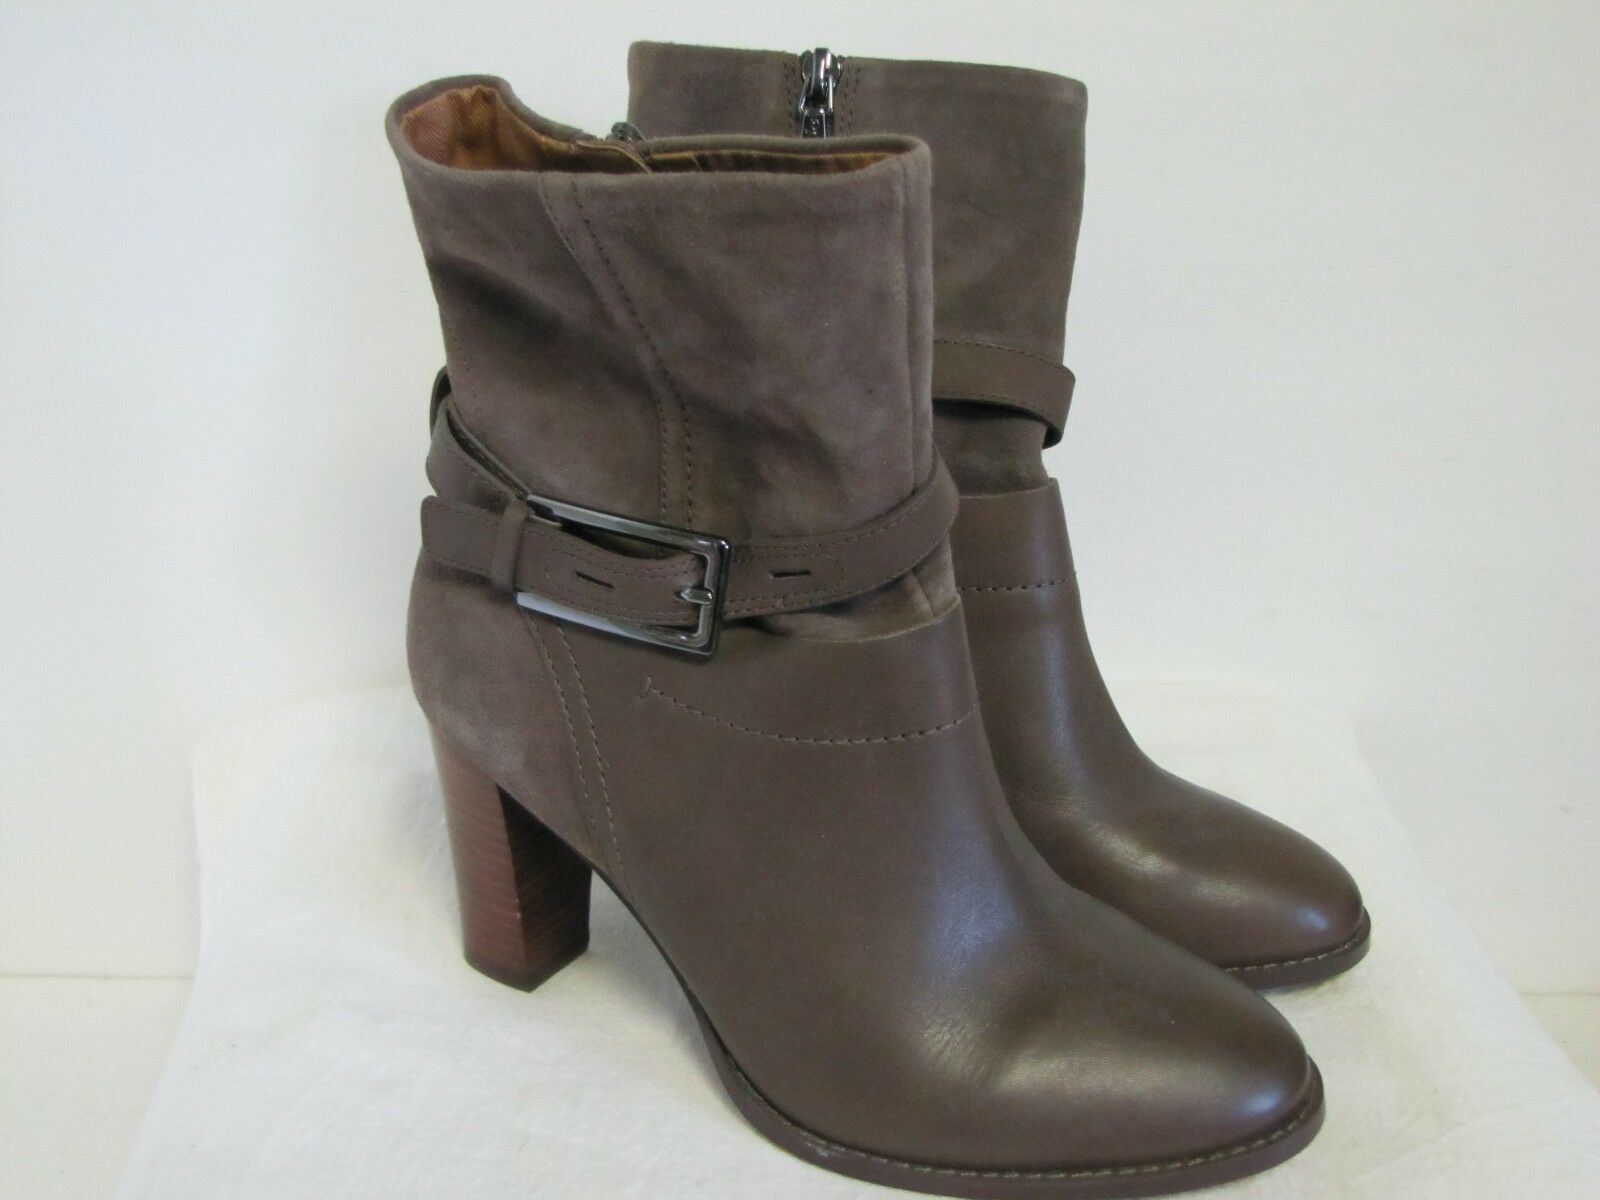 NWT Clarks Kacia Garnet Ladies Leather Taupe Lt. Mocha Mid Calf Zipper Boots 7.5